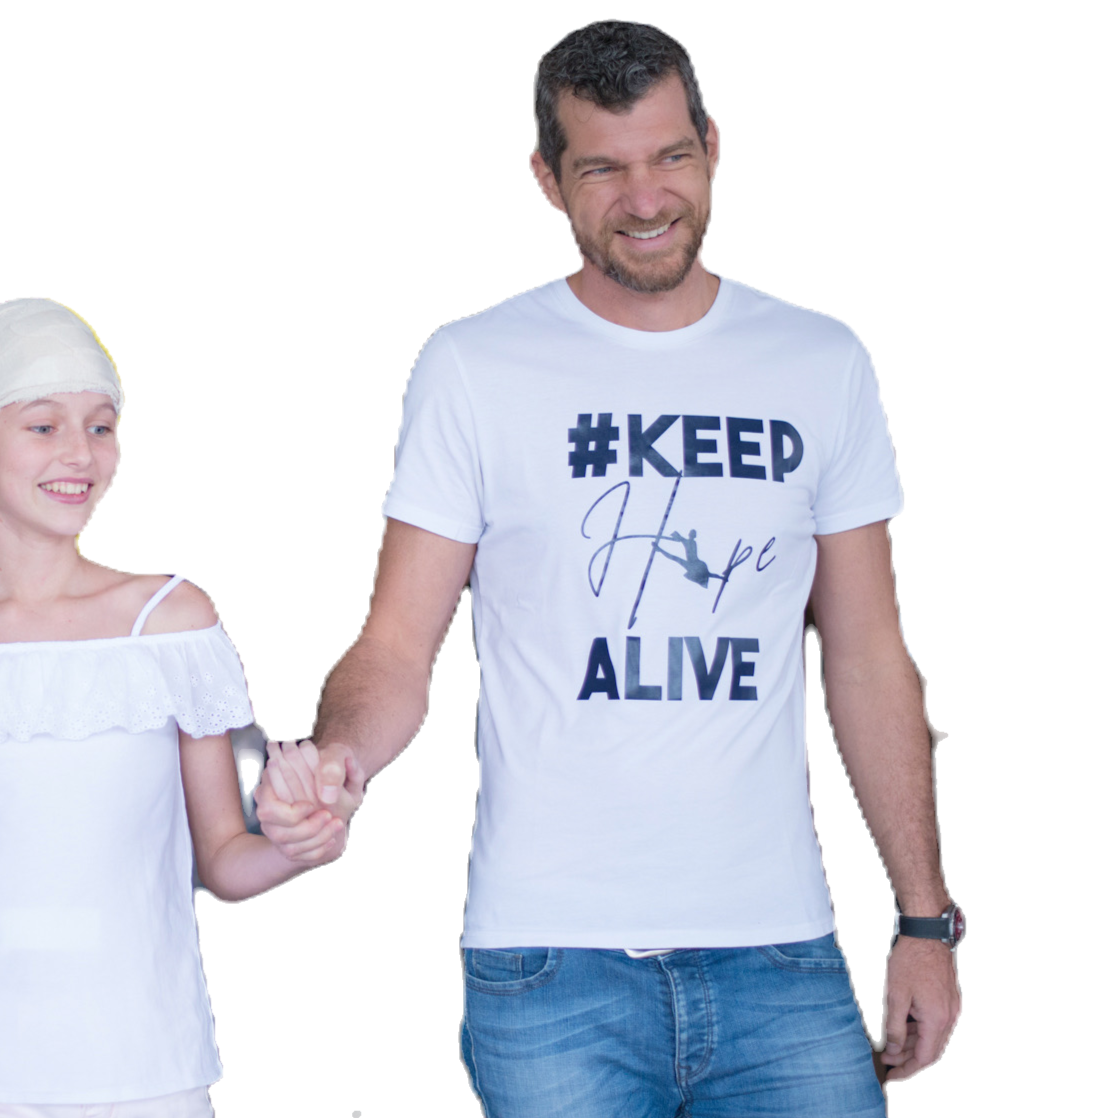 Keep Hope Alive T-shirt